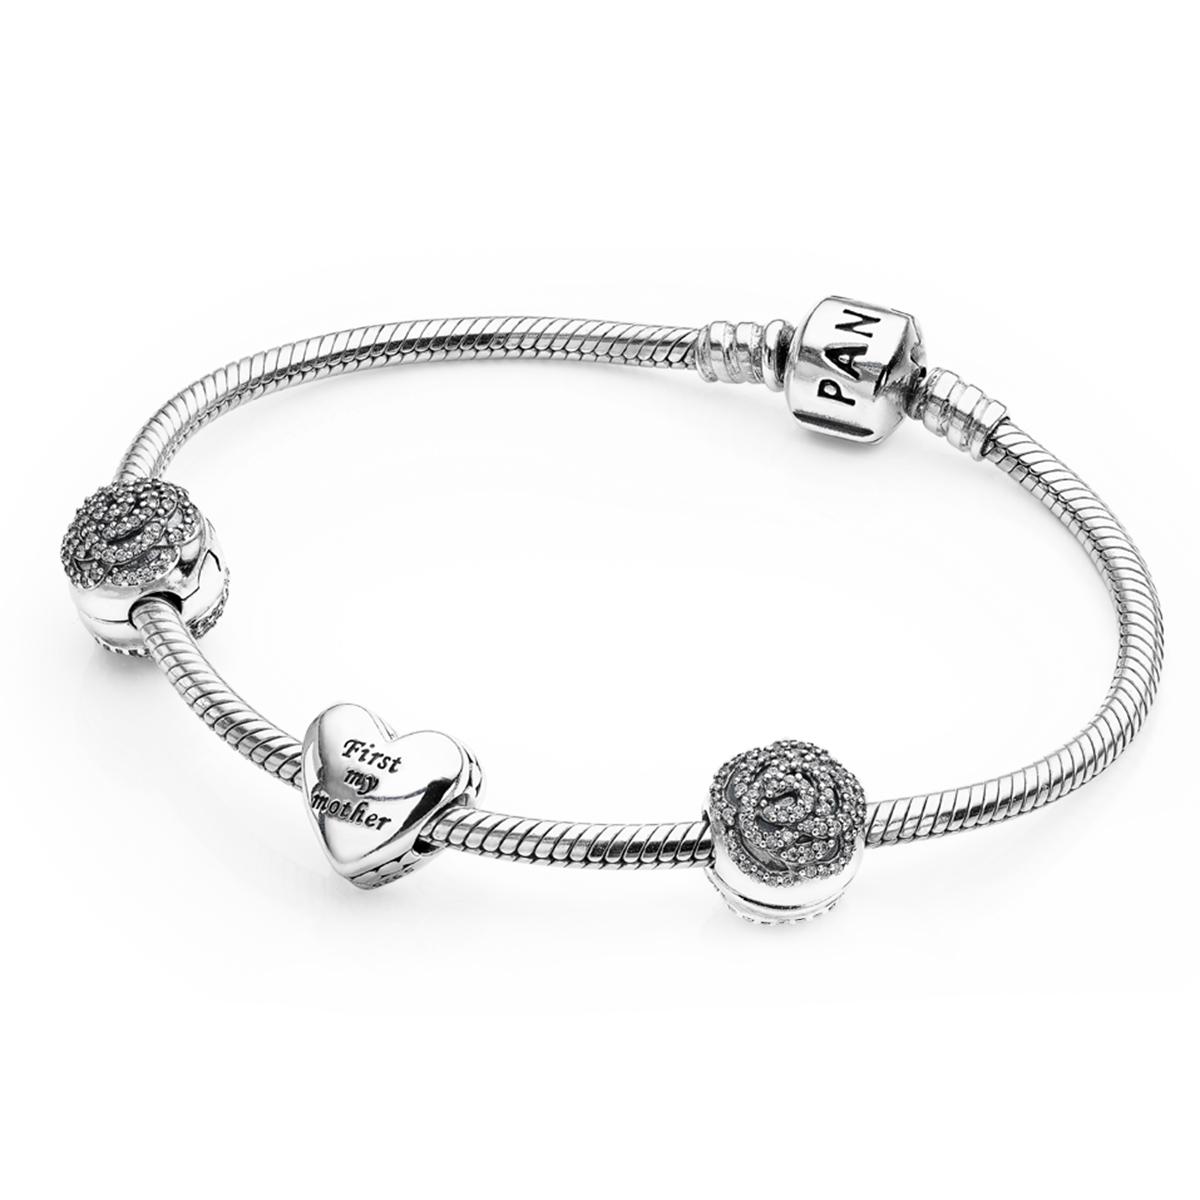 PANDORA Bouquet Of Love Bracelet Gift Set